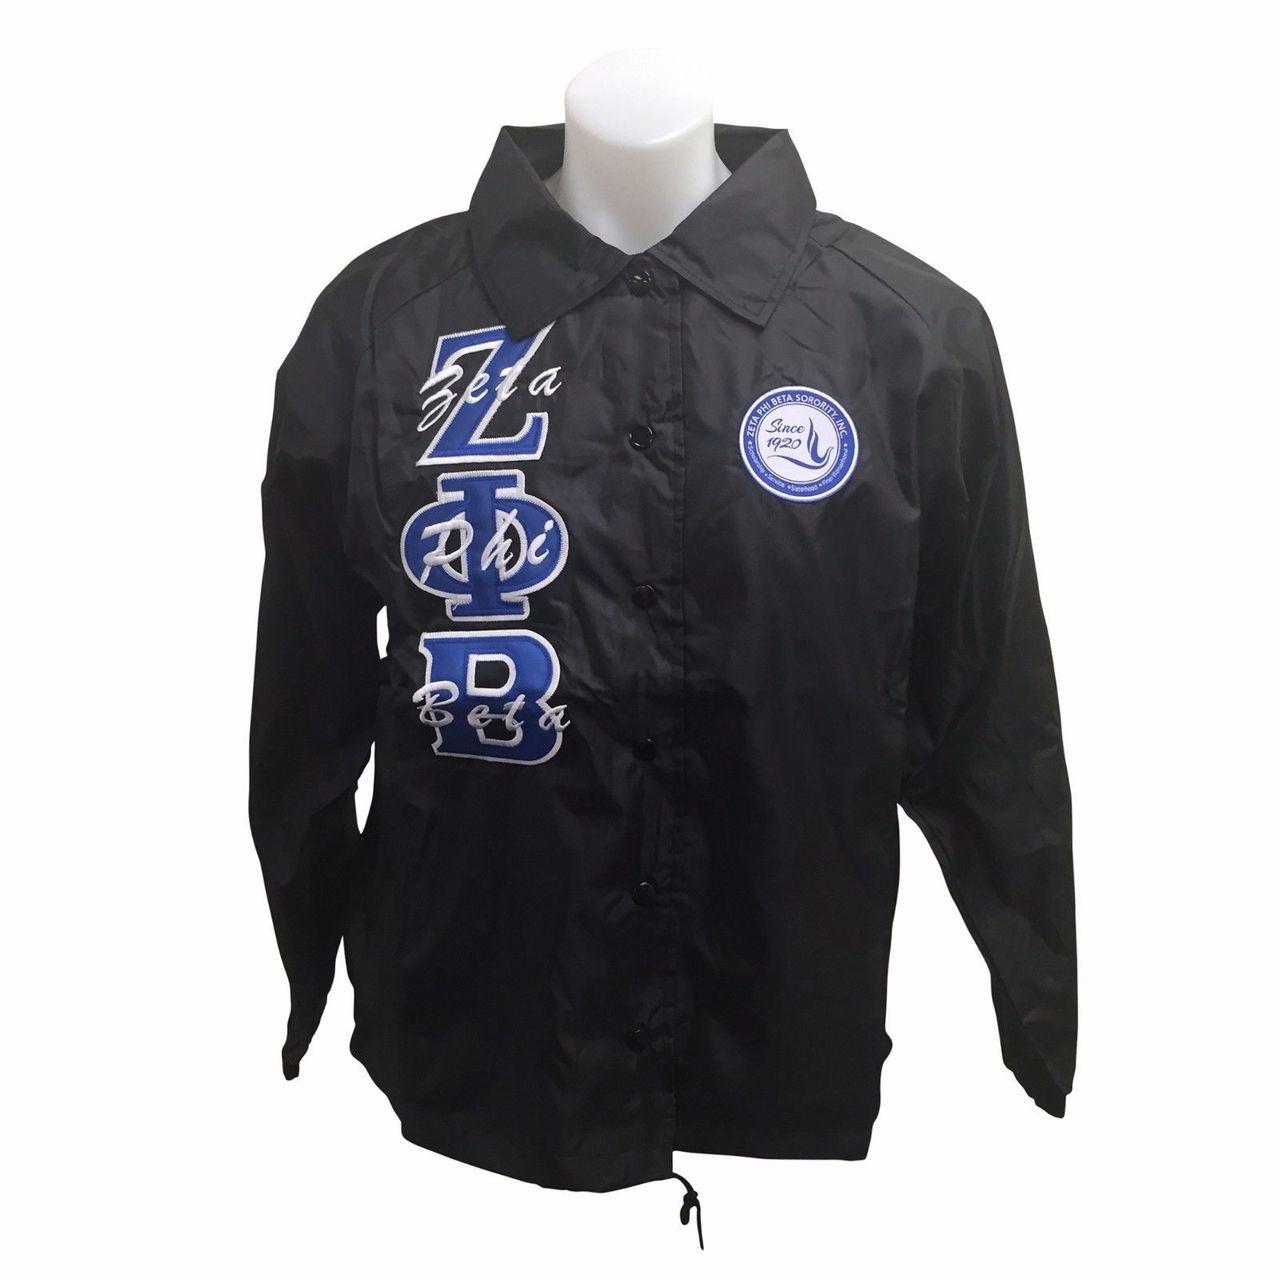 ZPB Line Jacket - Black